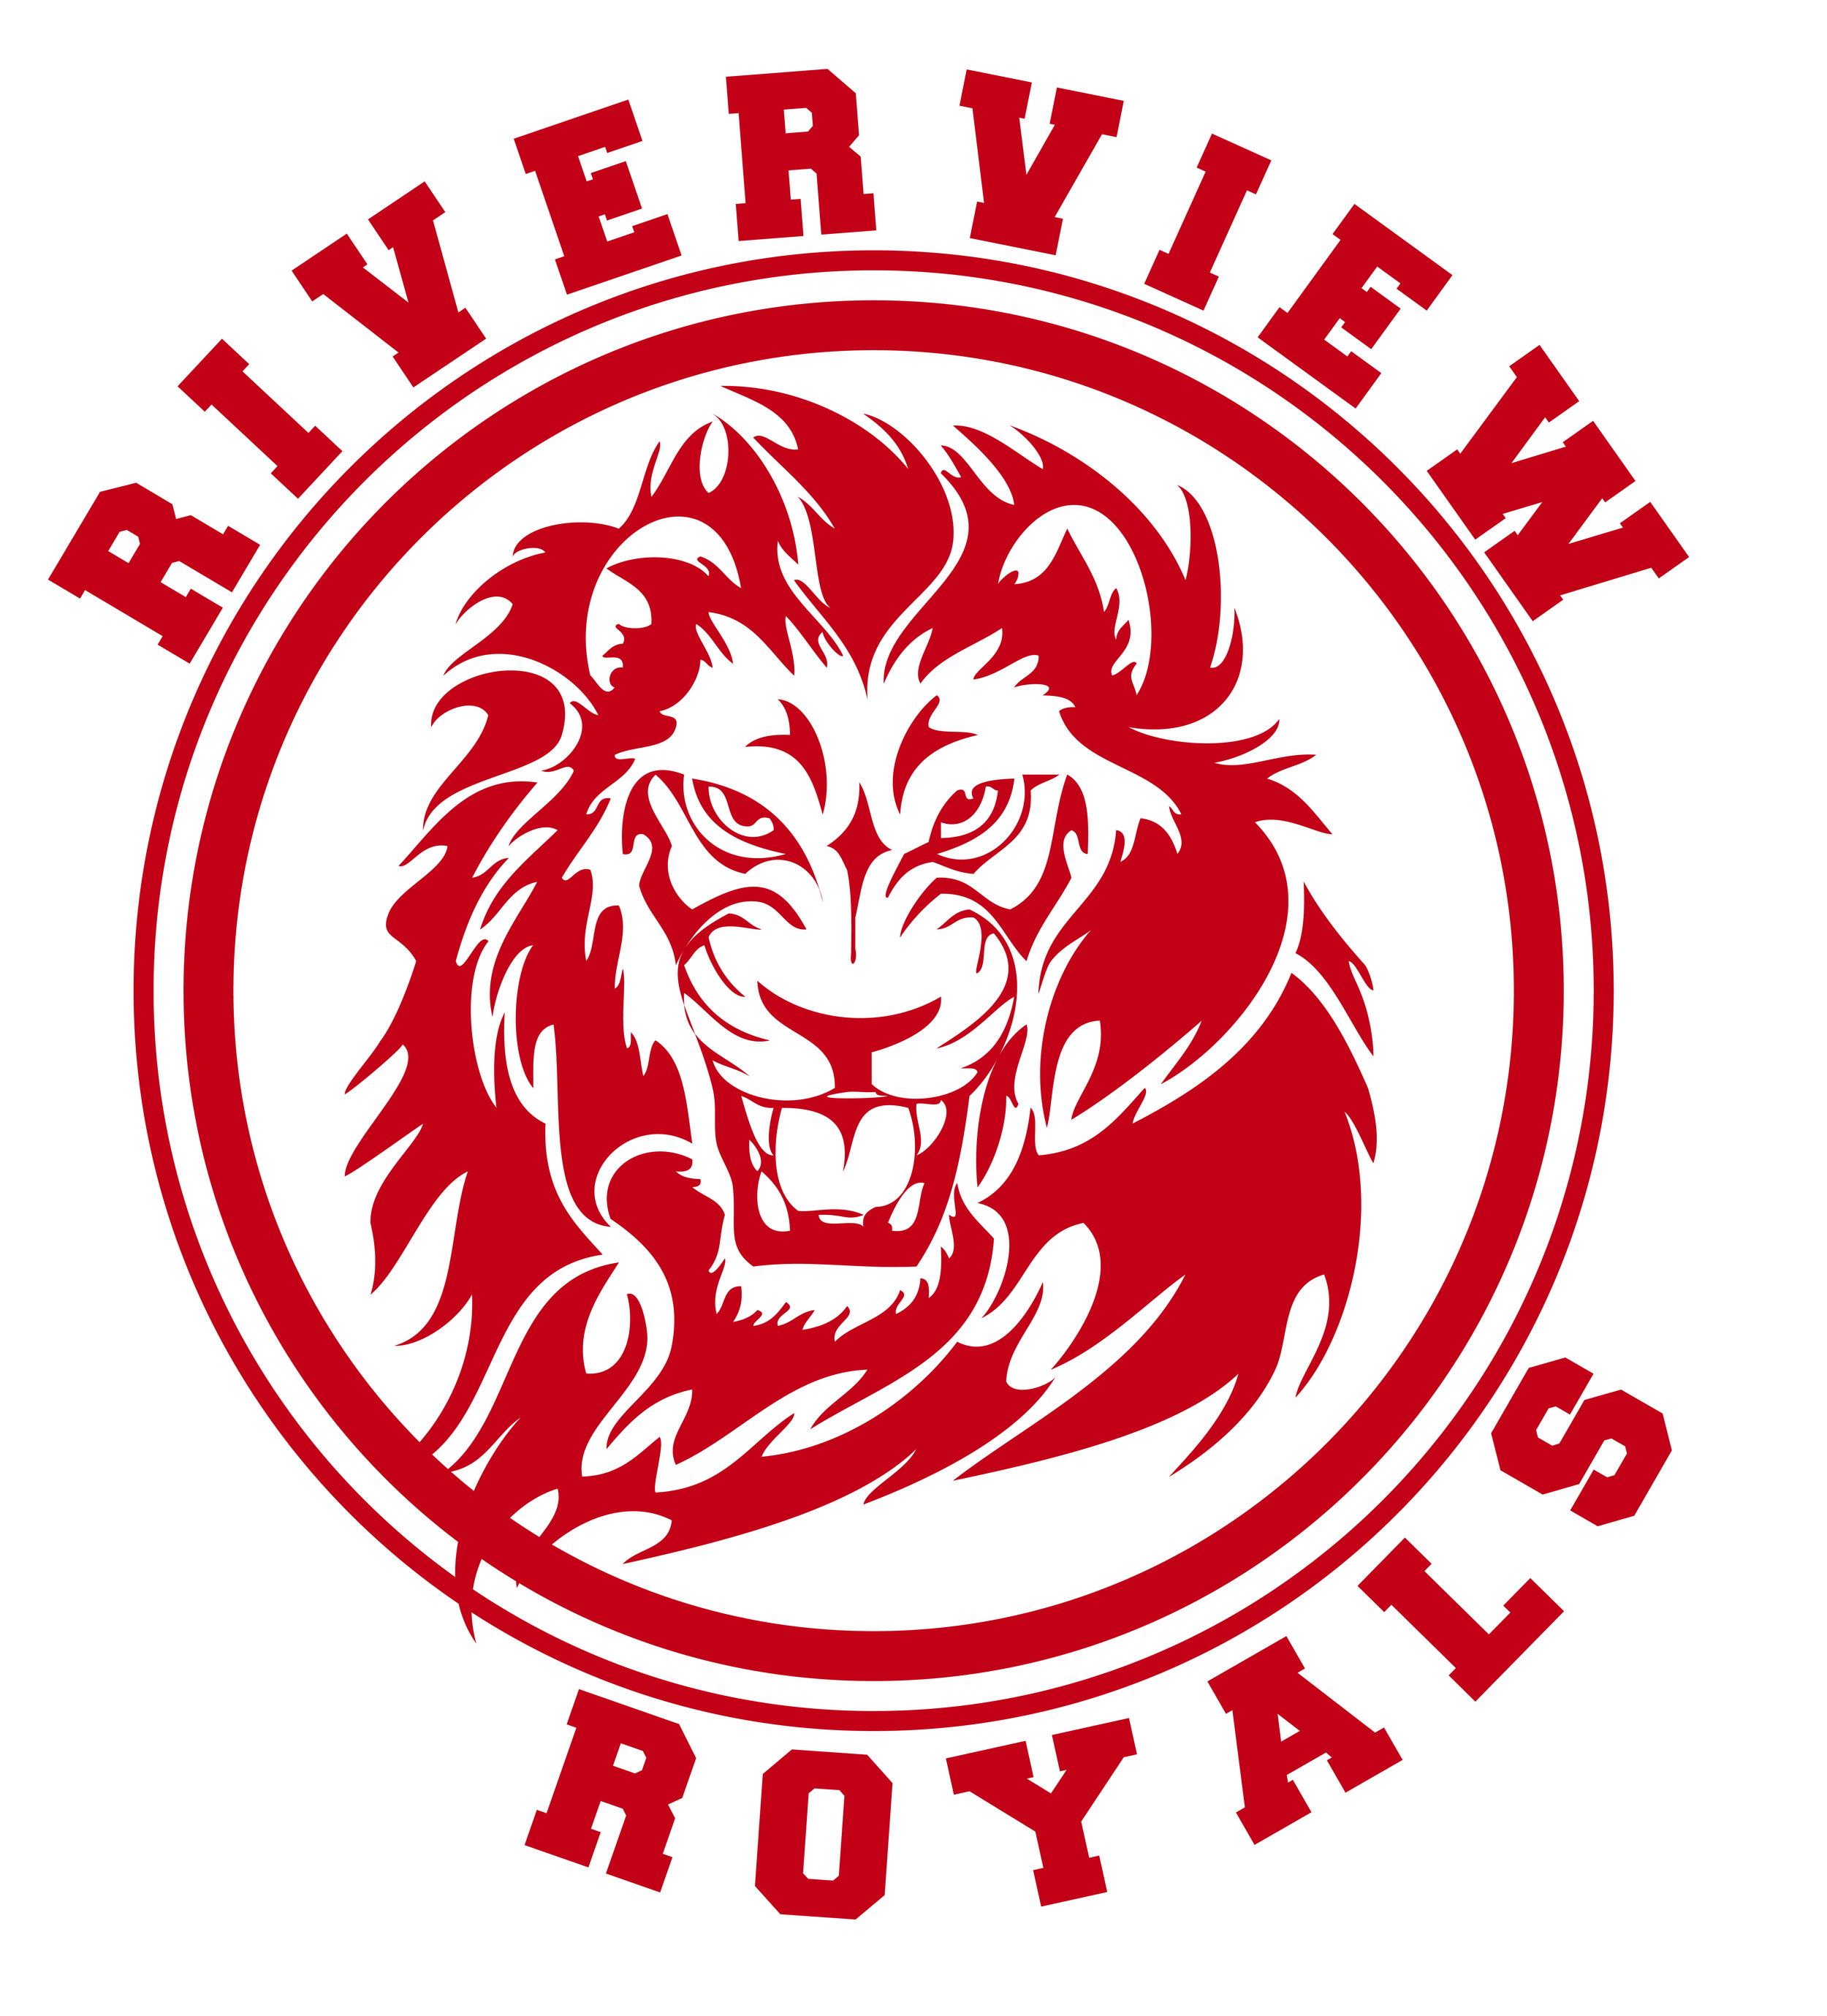 Royals red.jpg